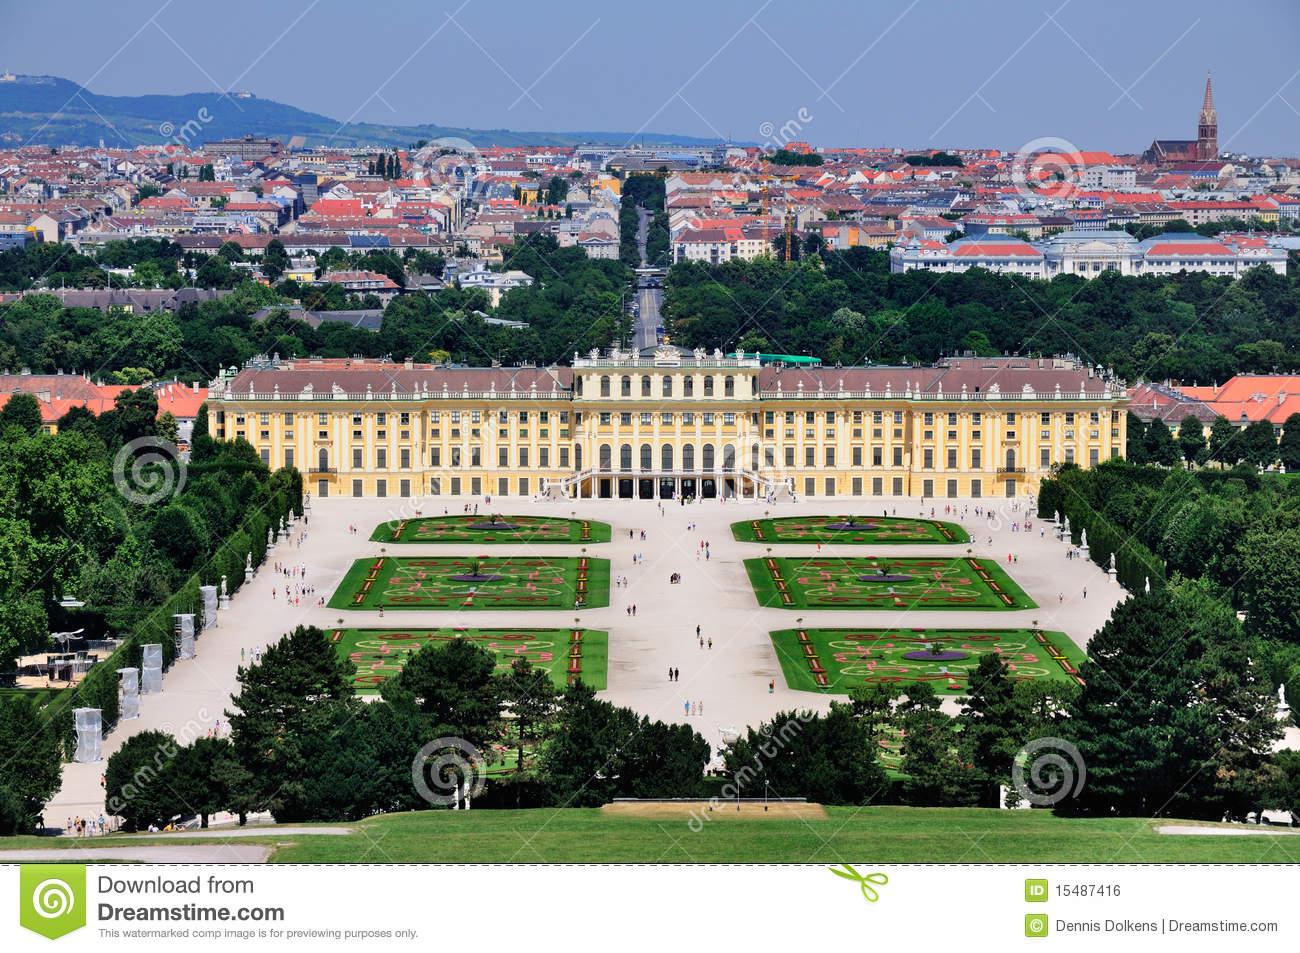 Schloss Schönbrunn, Vienna, Austria Royalty Free Stock Image.